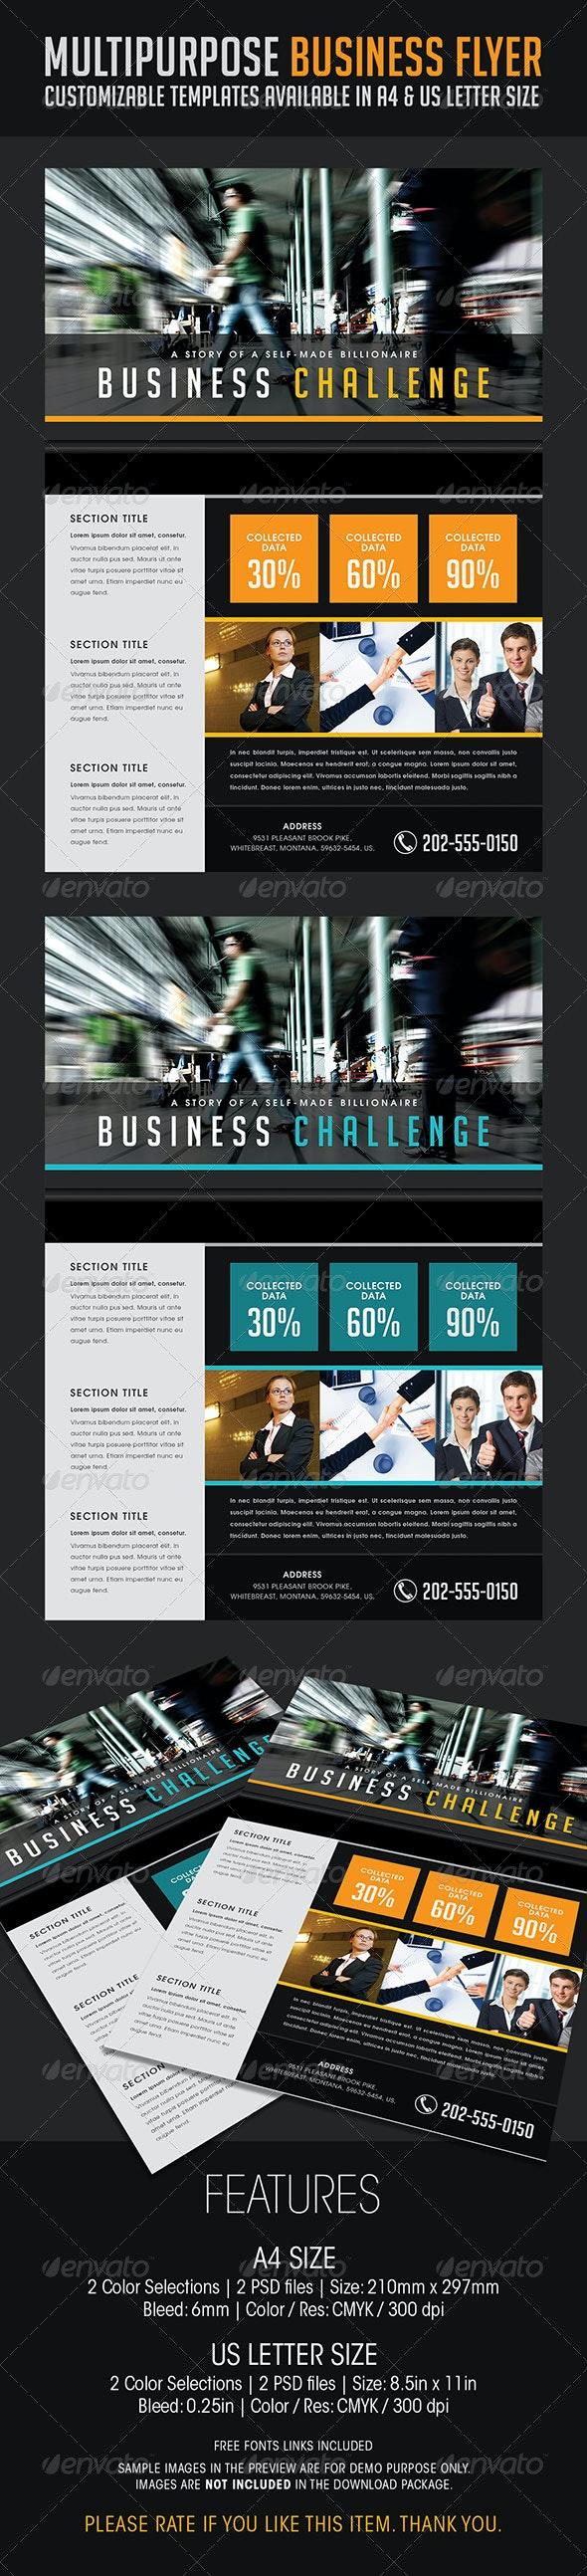 Multipurpose Business Flyer 07 - Corporate Flyers